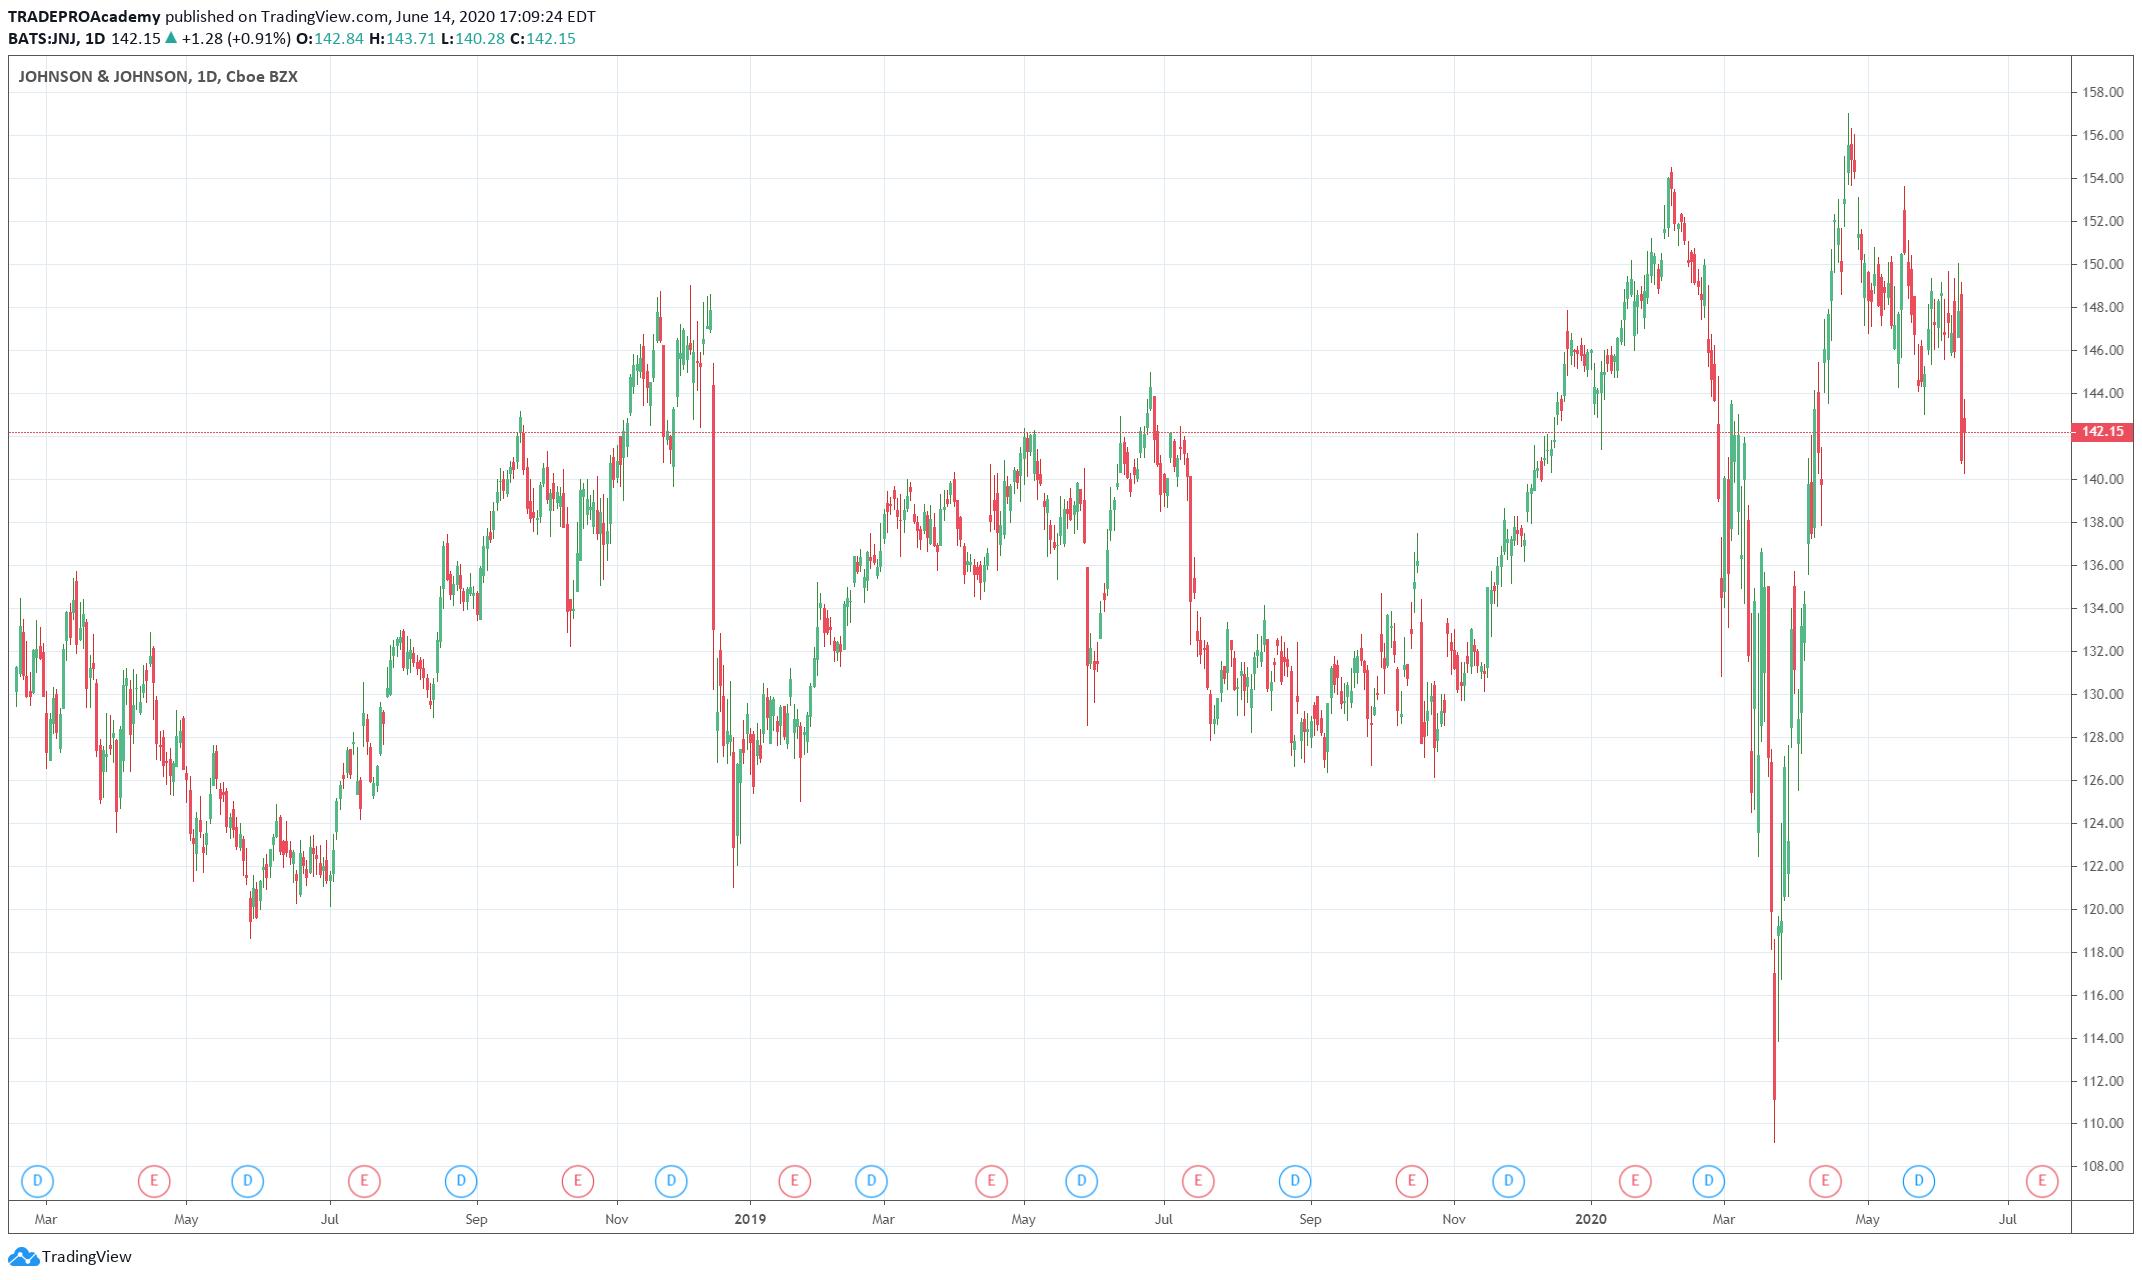 Johnson & Johnson Stocks Flow Chart